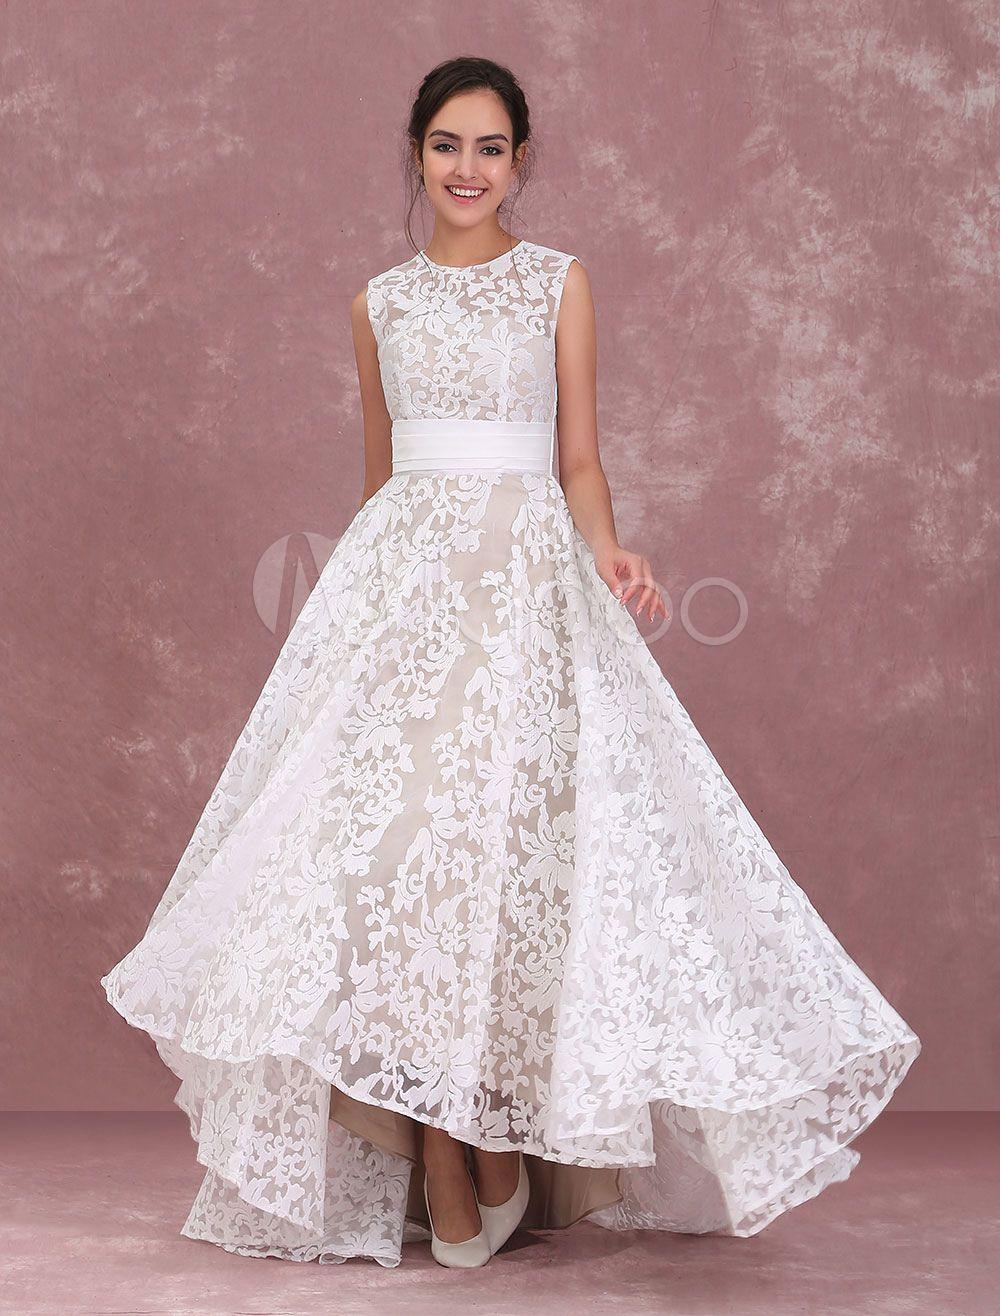 6a30d72c3f2 Champagne Wedding Dresses Lace High Low Beach Bridal Dress Pleated Sash  Asymmetrical Wedding Gown - Milanoo.com